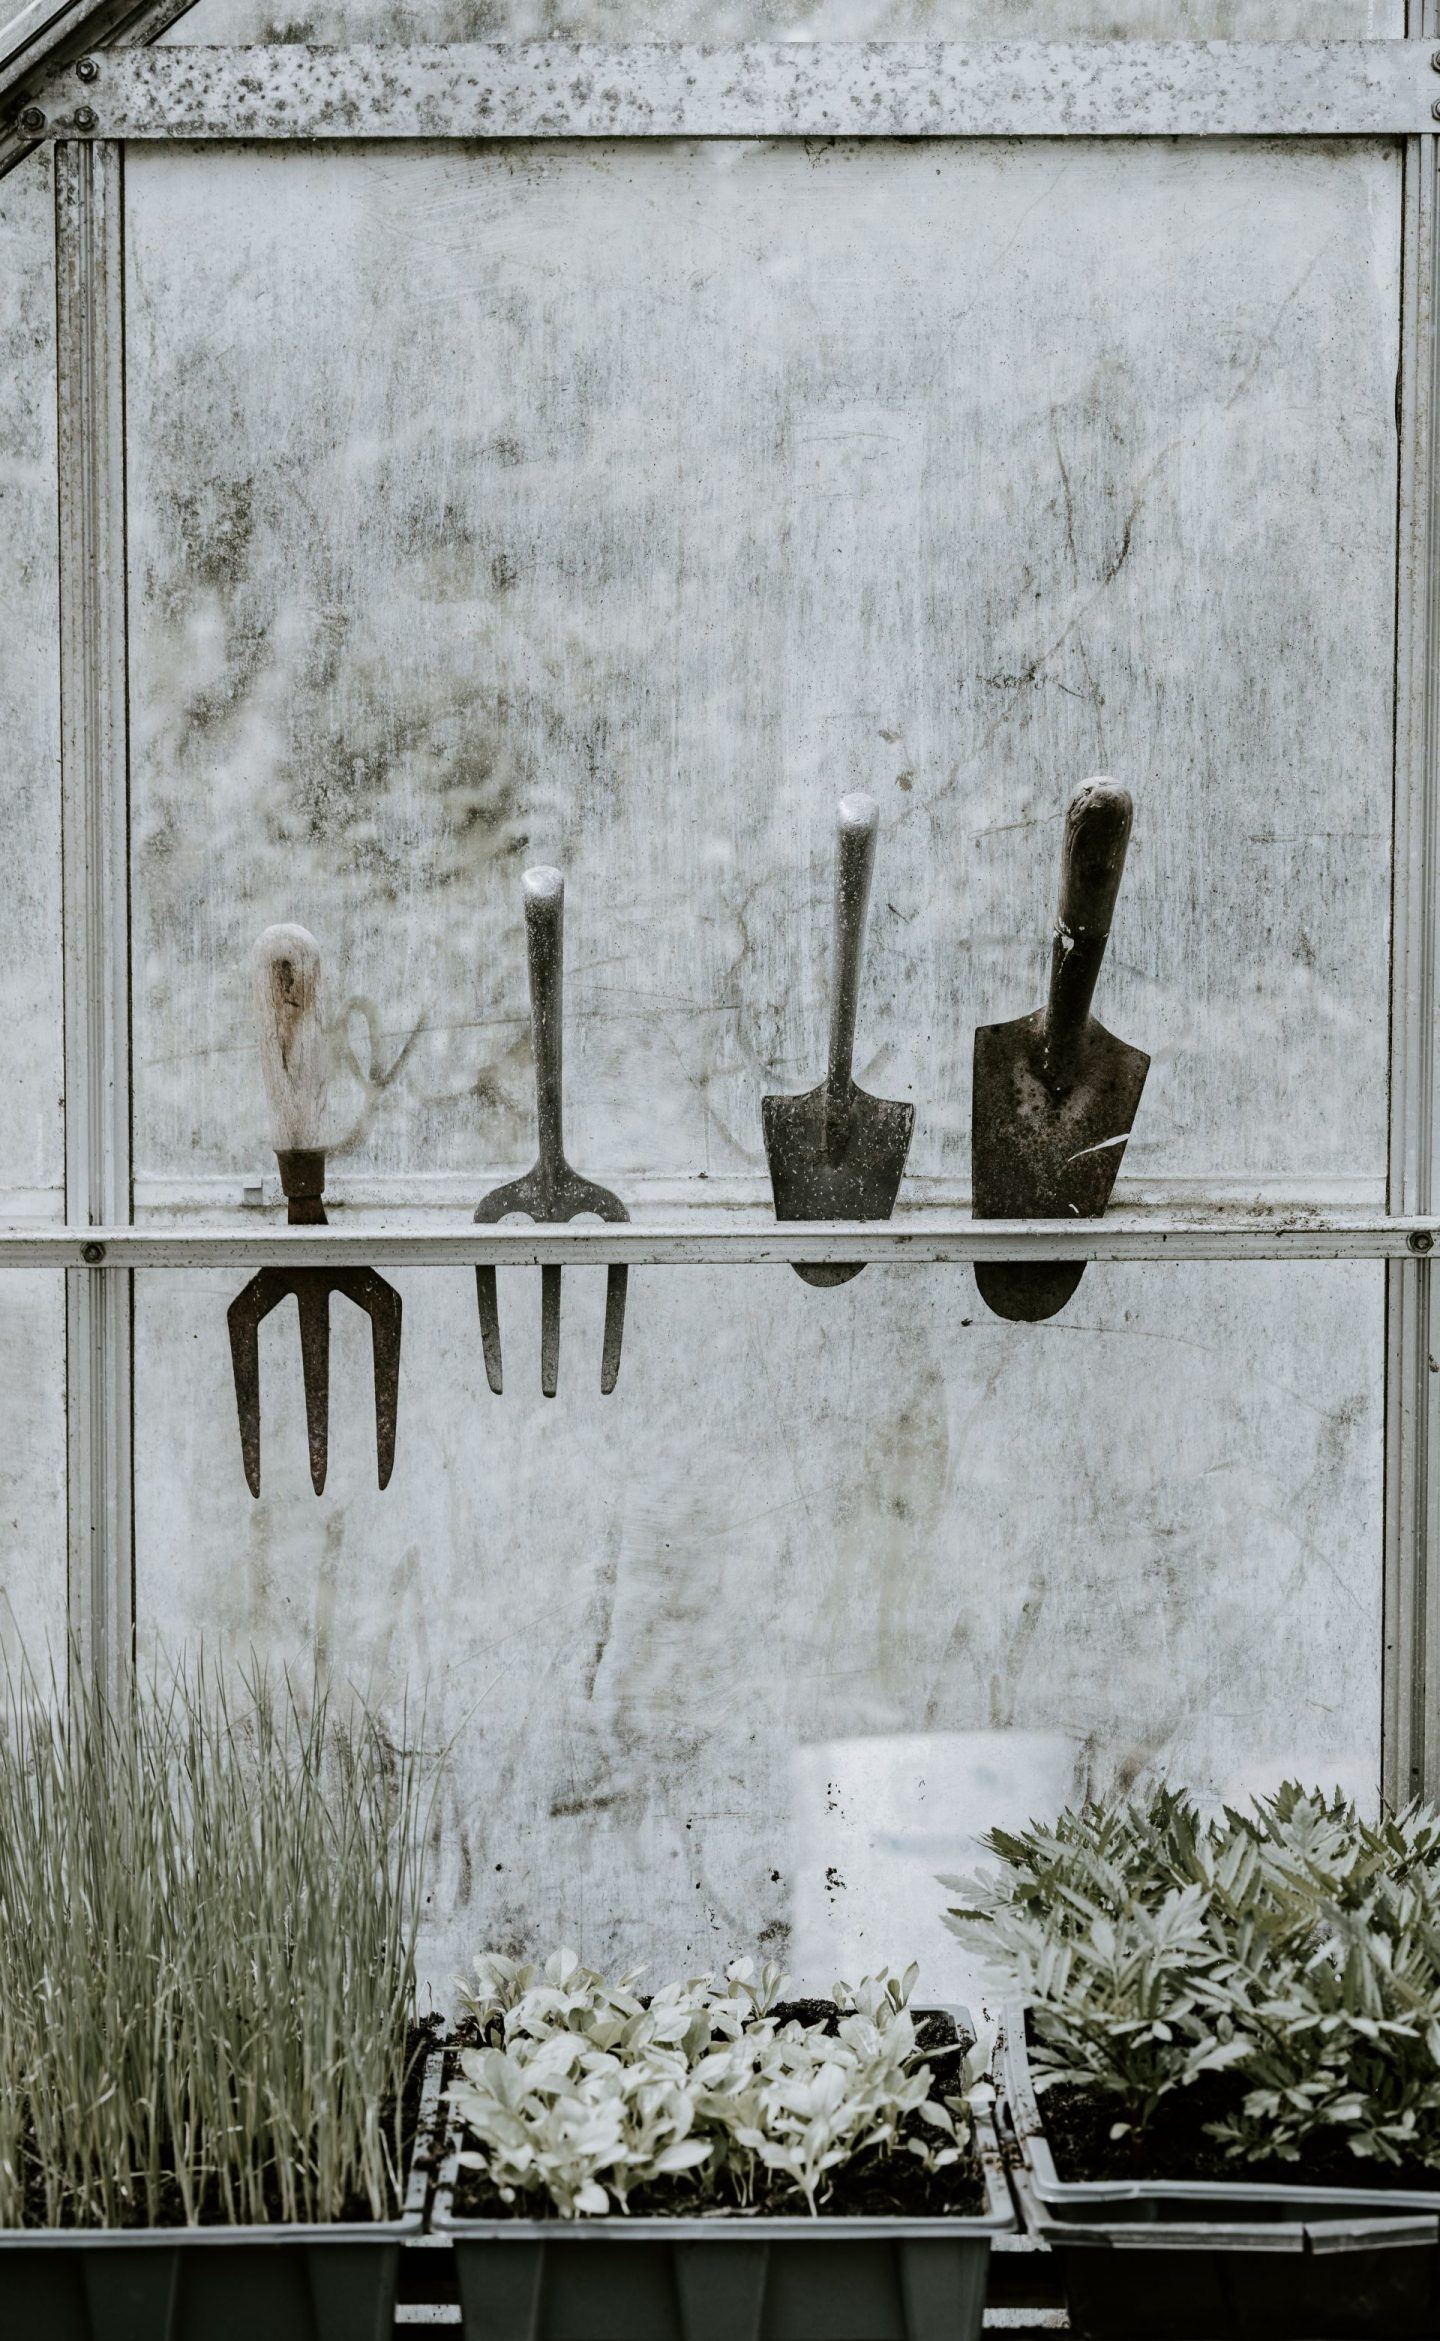 common gardening mistakes to avoid